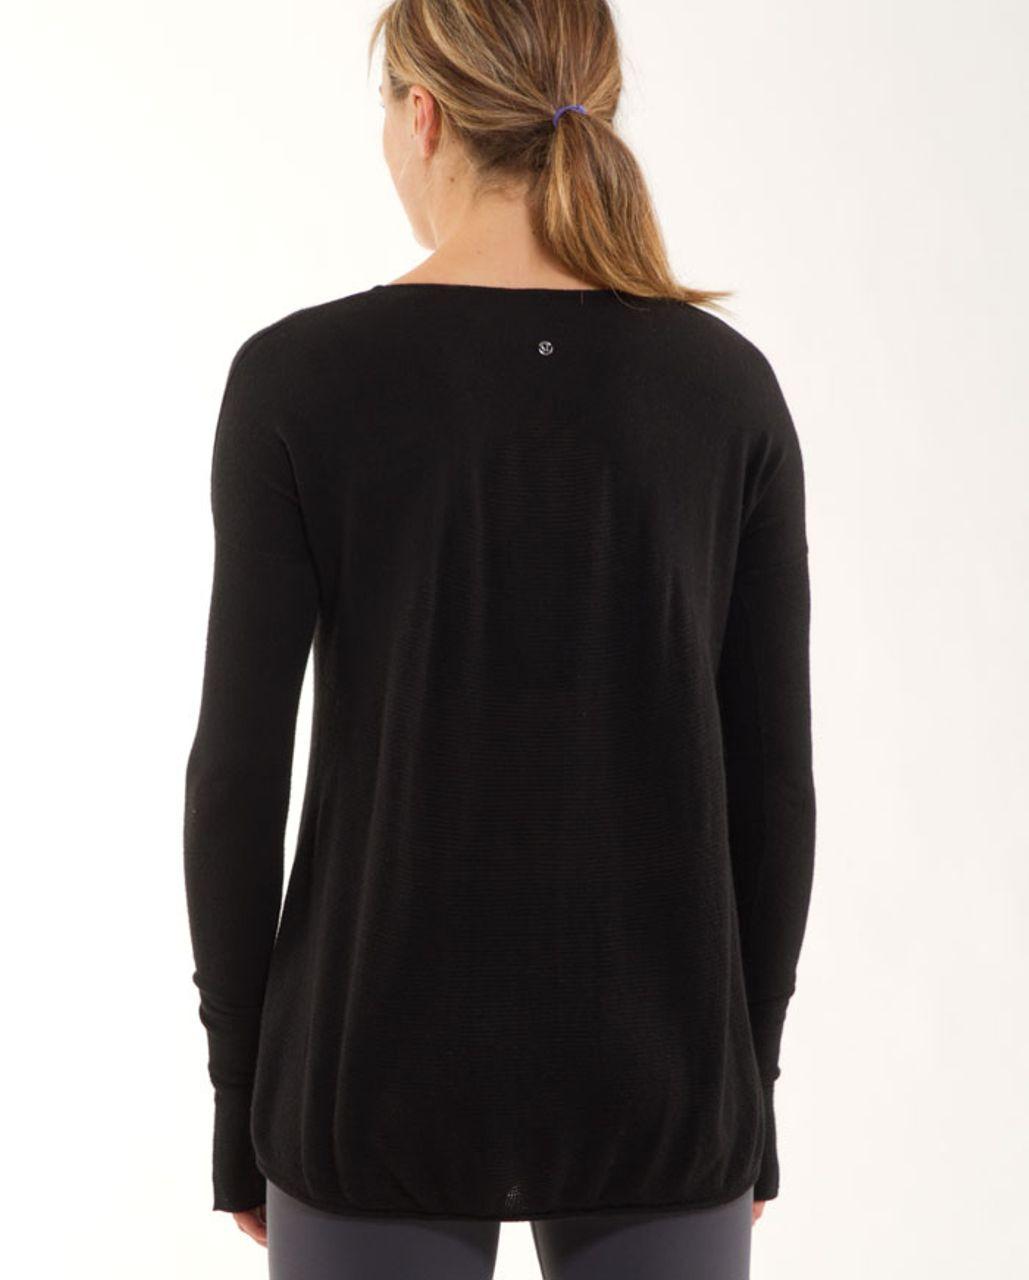 Lululemon Yoga Cozy Pullover - Black